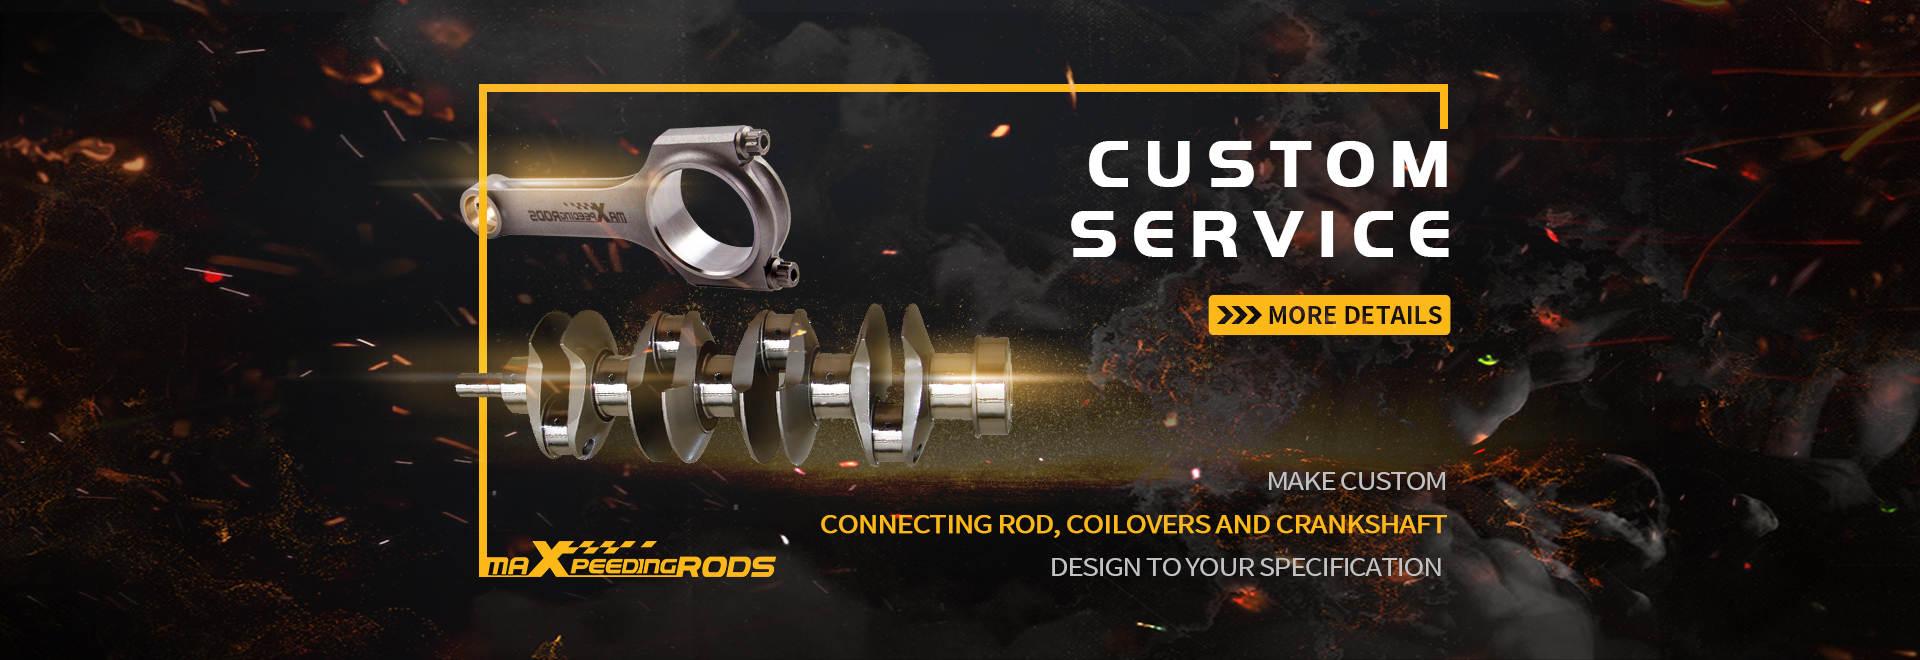 Maxpeedingrods Custom Service